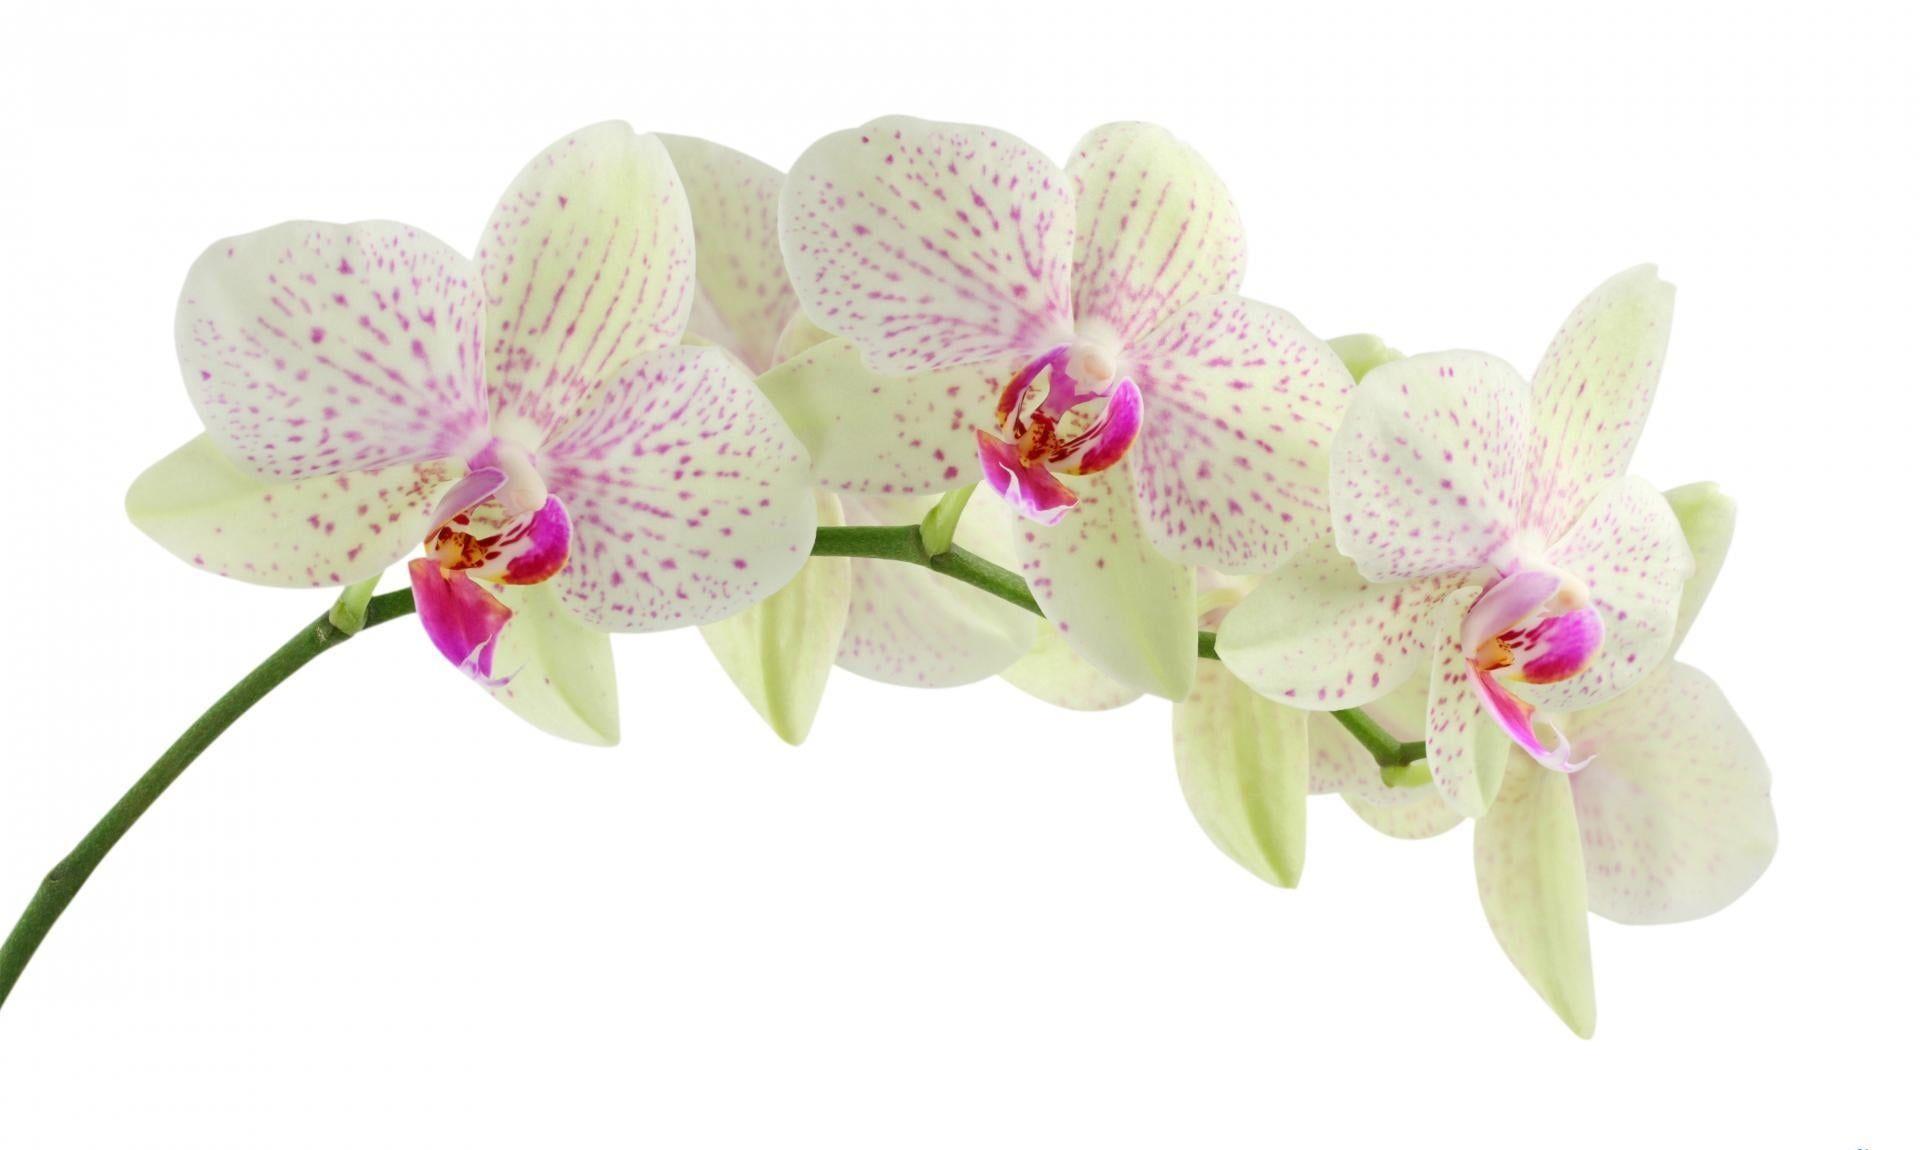 Green And Pink Flowers Orchid Flower White Branch Background 1080p Wallpaper Hdwallpaper Desktop In 2020 Orchid Flower Orchid Wallpaper White Orchids